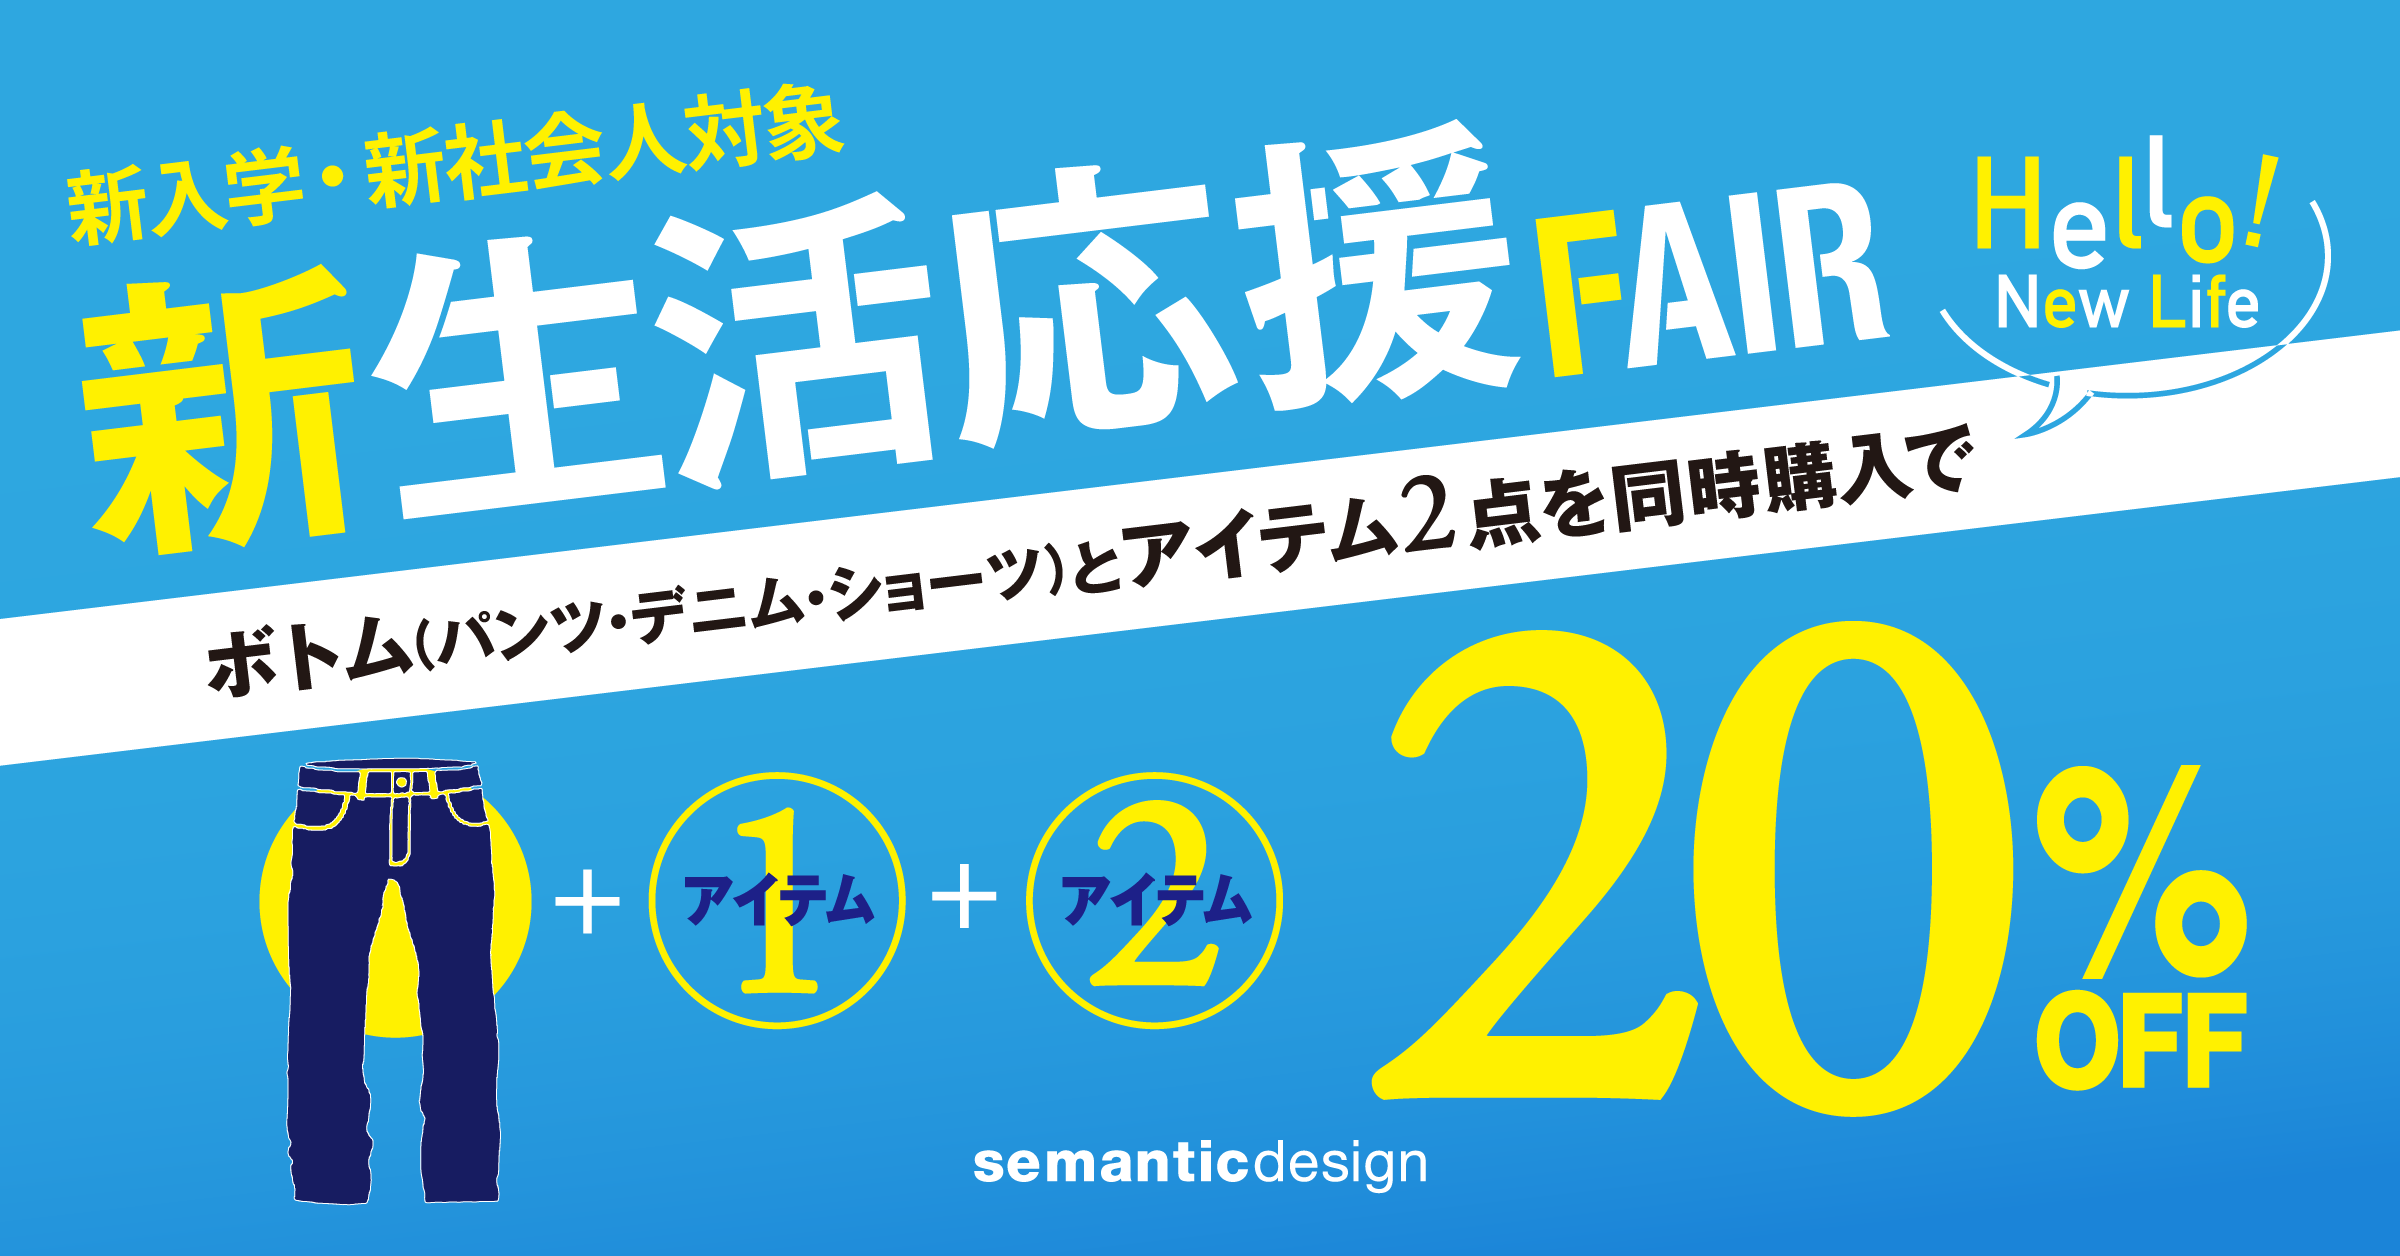 semanticdesign 新生活応援フェア